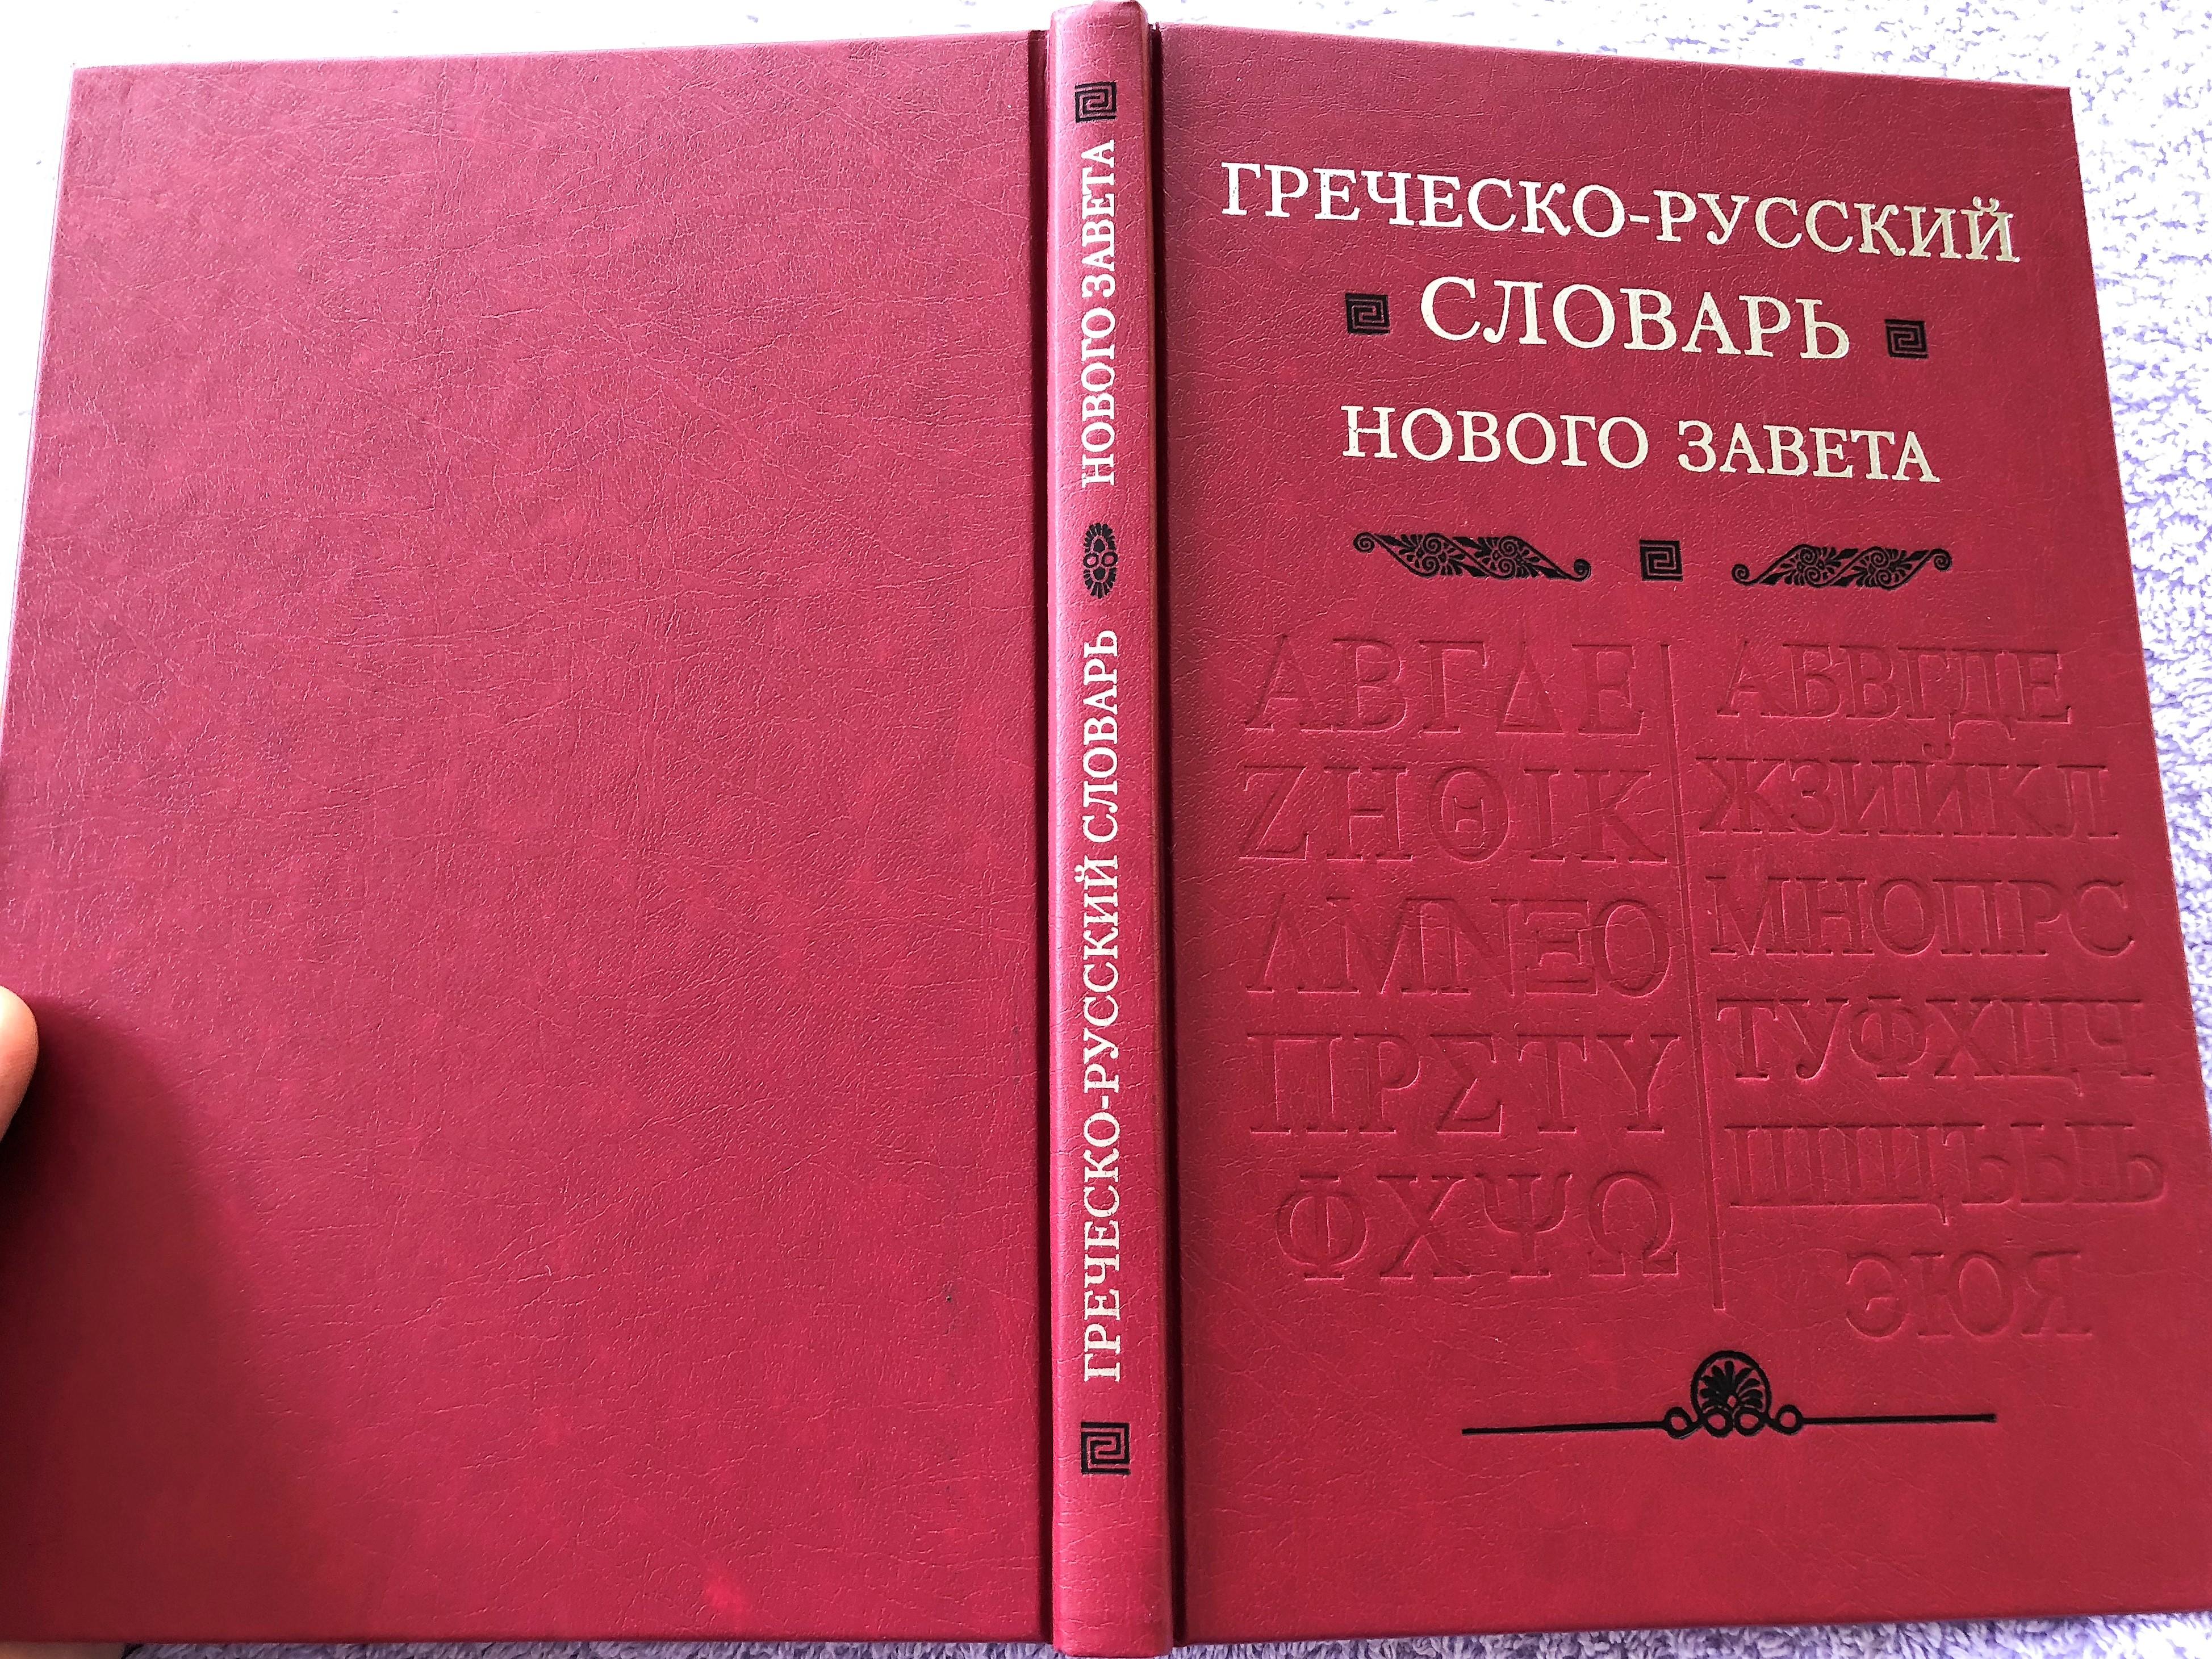 greek-russian-new-testament-dictionary-13-.jpg